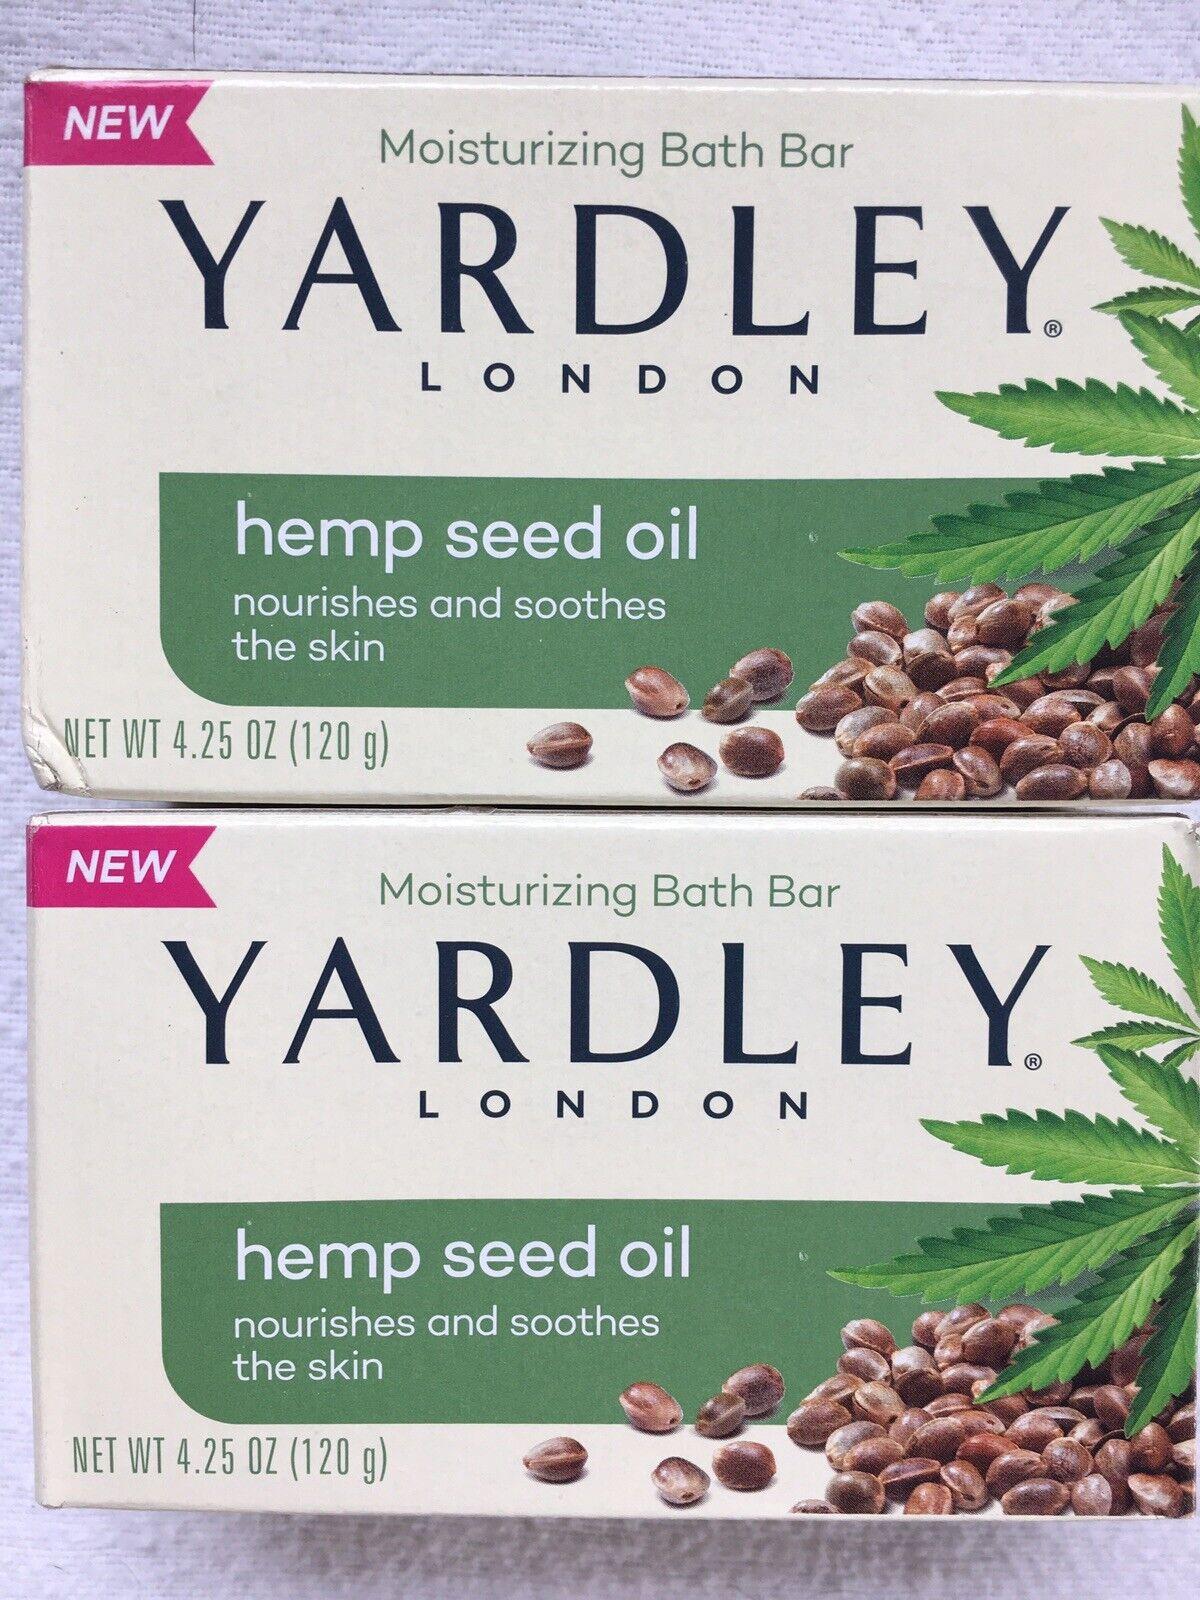 6x Yardley London Moisturizing Hemp Seed Oil Bath Bar Soap 4 25 Oz Each For Sale Online Ebay